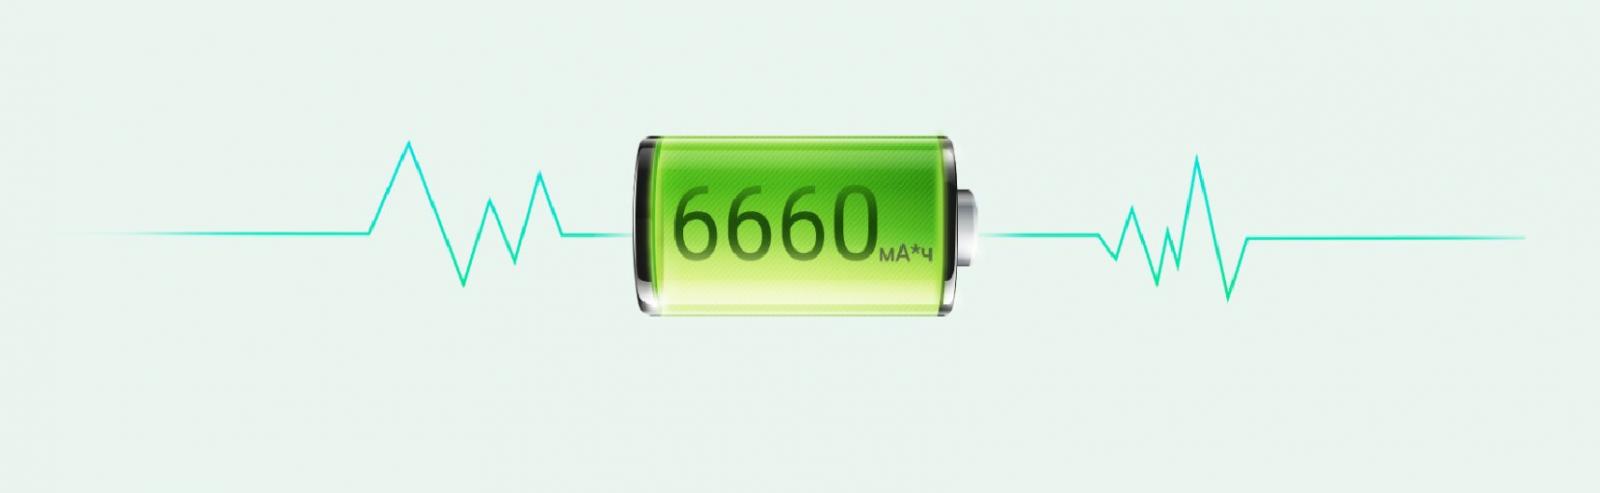 Huawei MediaPad M3 lite 10 с мощной батарее на целый день в 6660 мАч